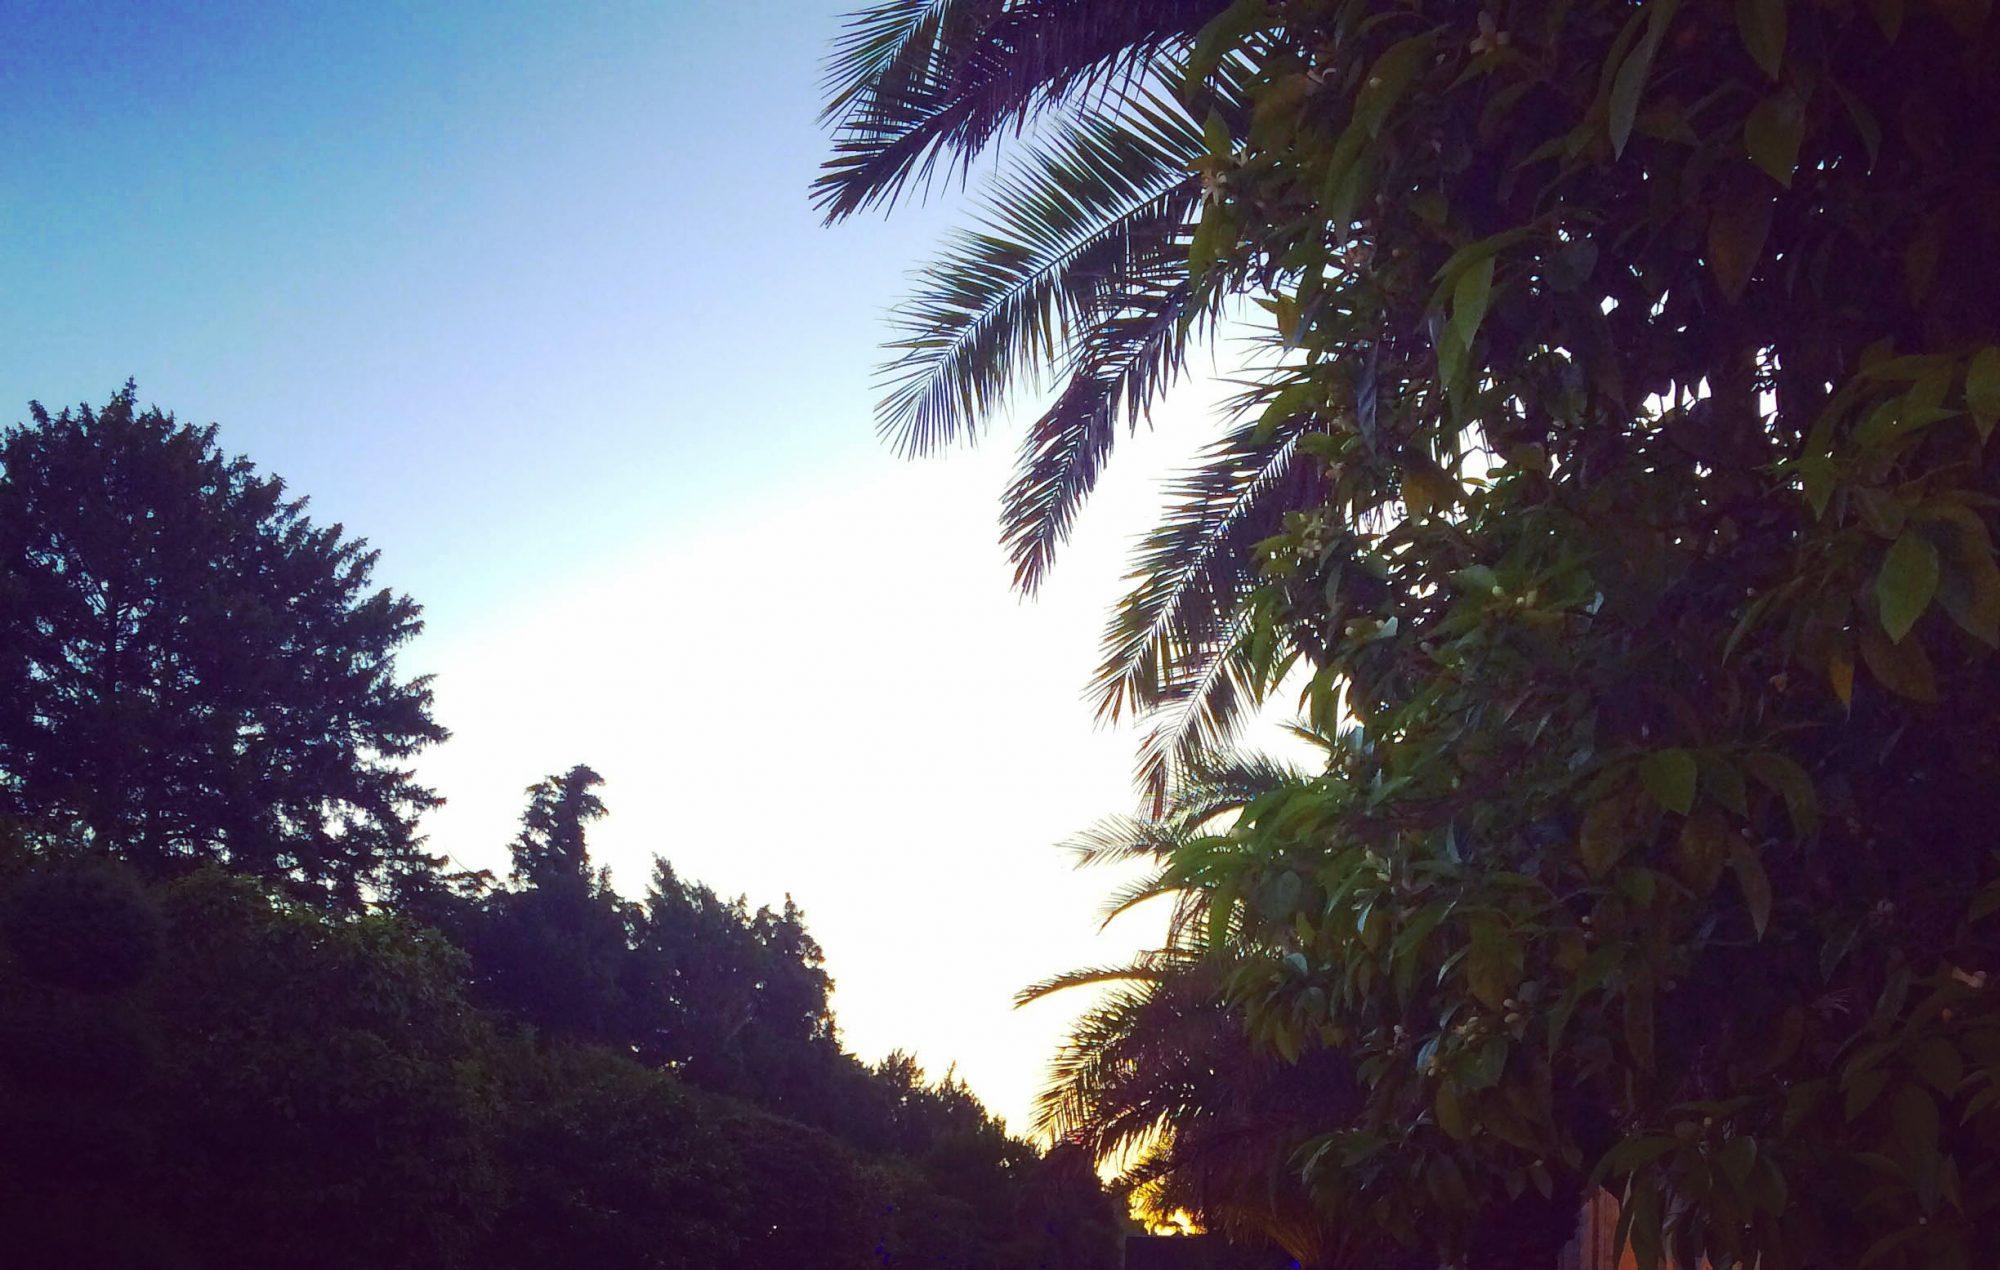 bal masque versailles 2016 orangerie palmiers matin